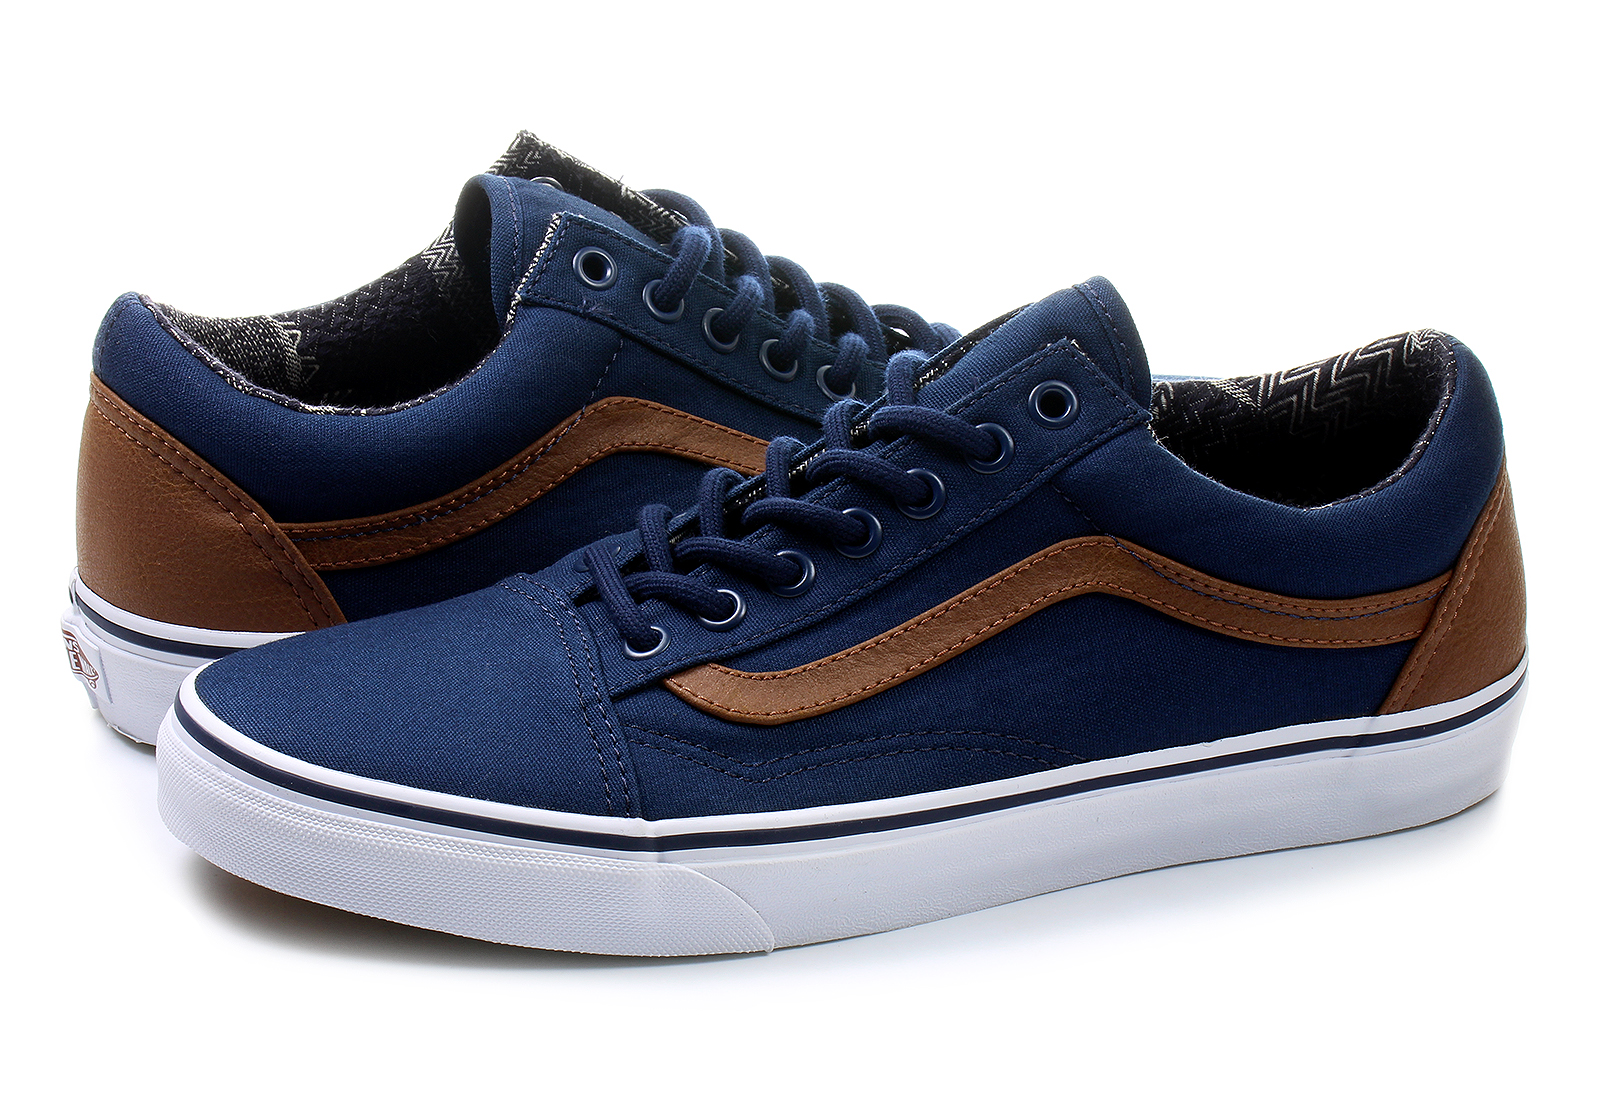 7ae4c05e5e Vans Sneakers - Old Skool - VA38G1MVE - Online shop for sneakers ...